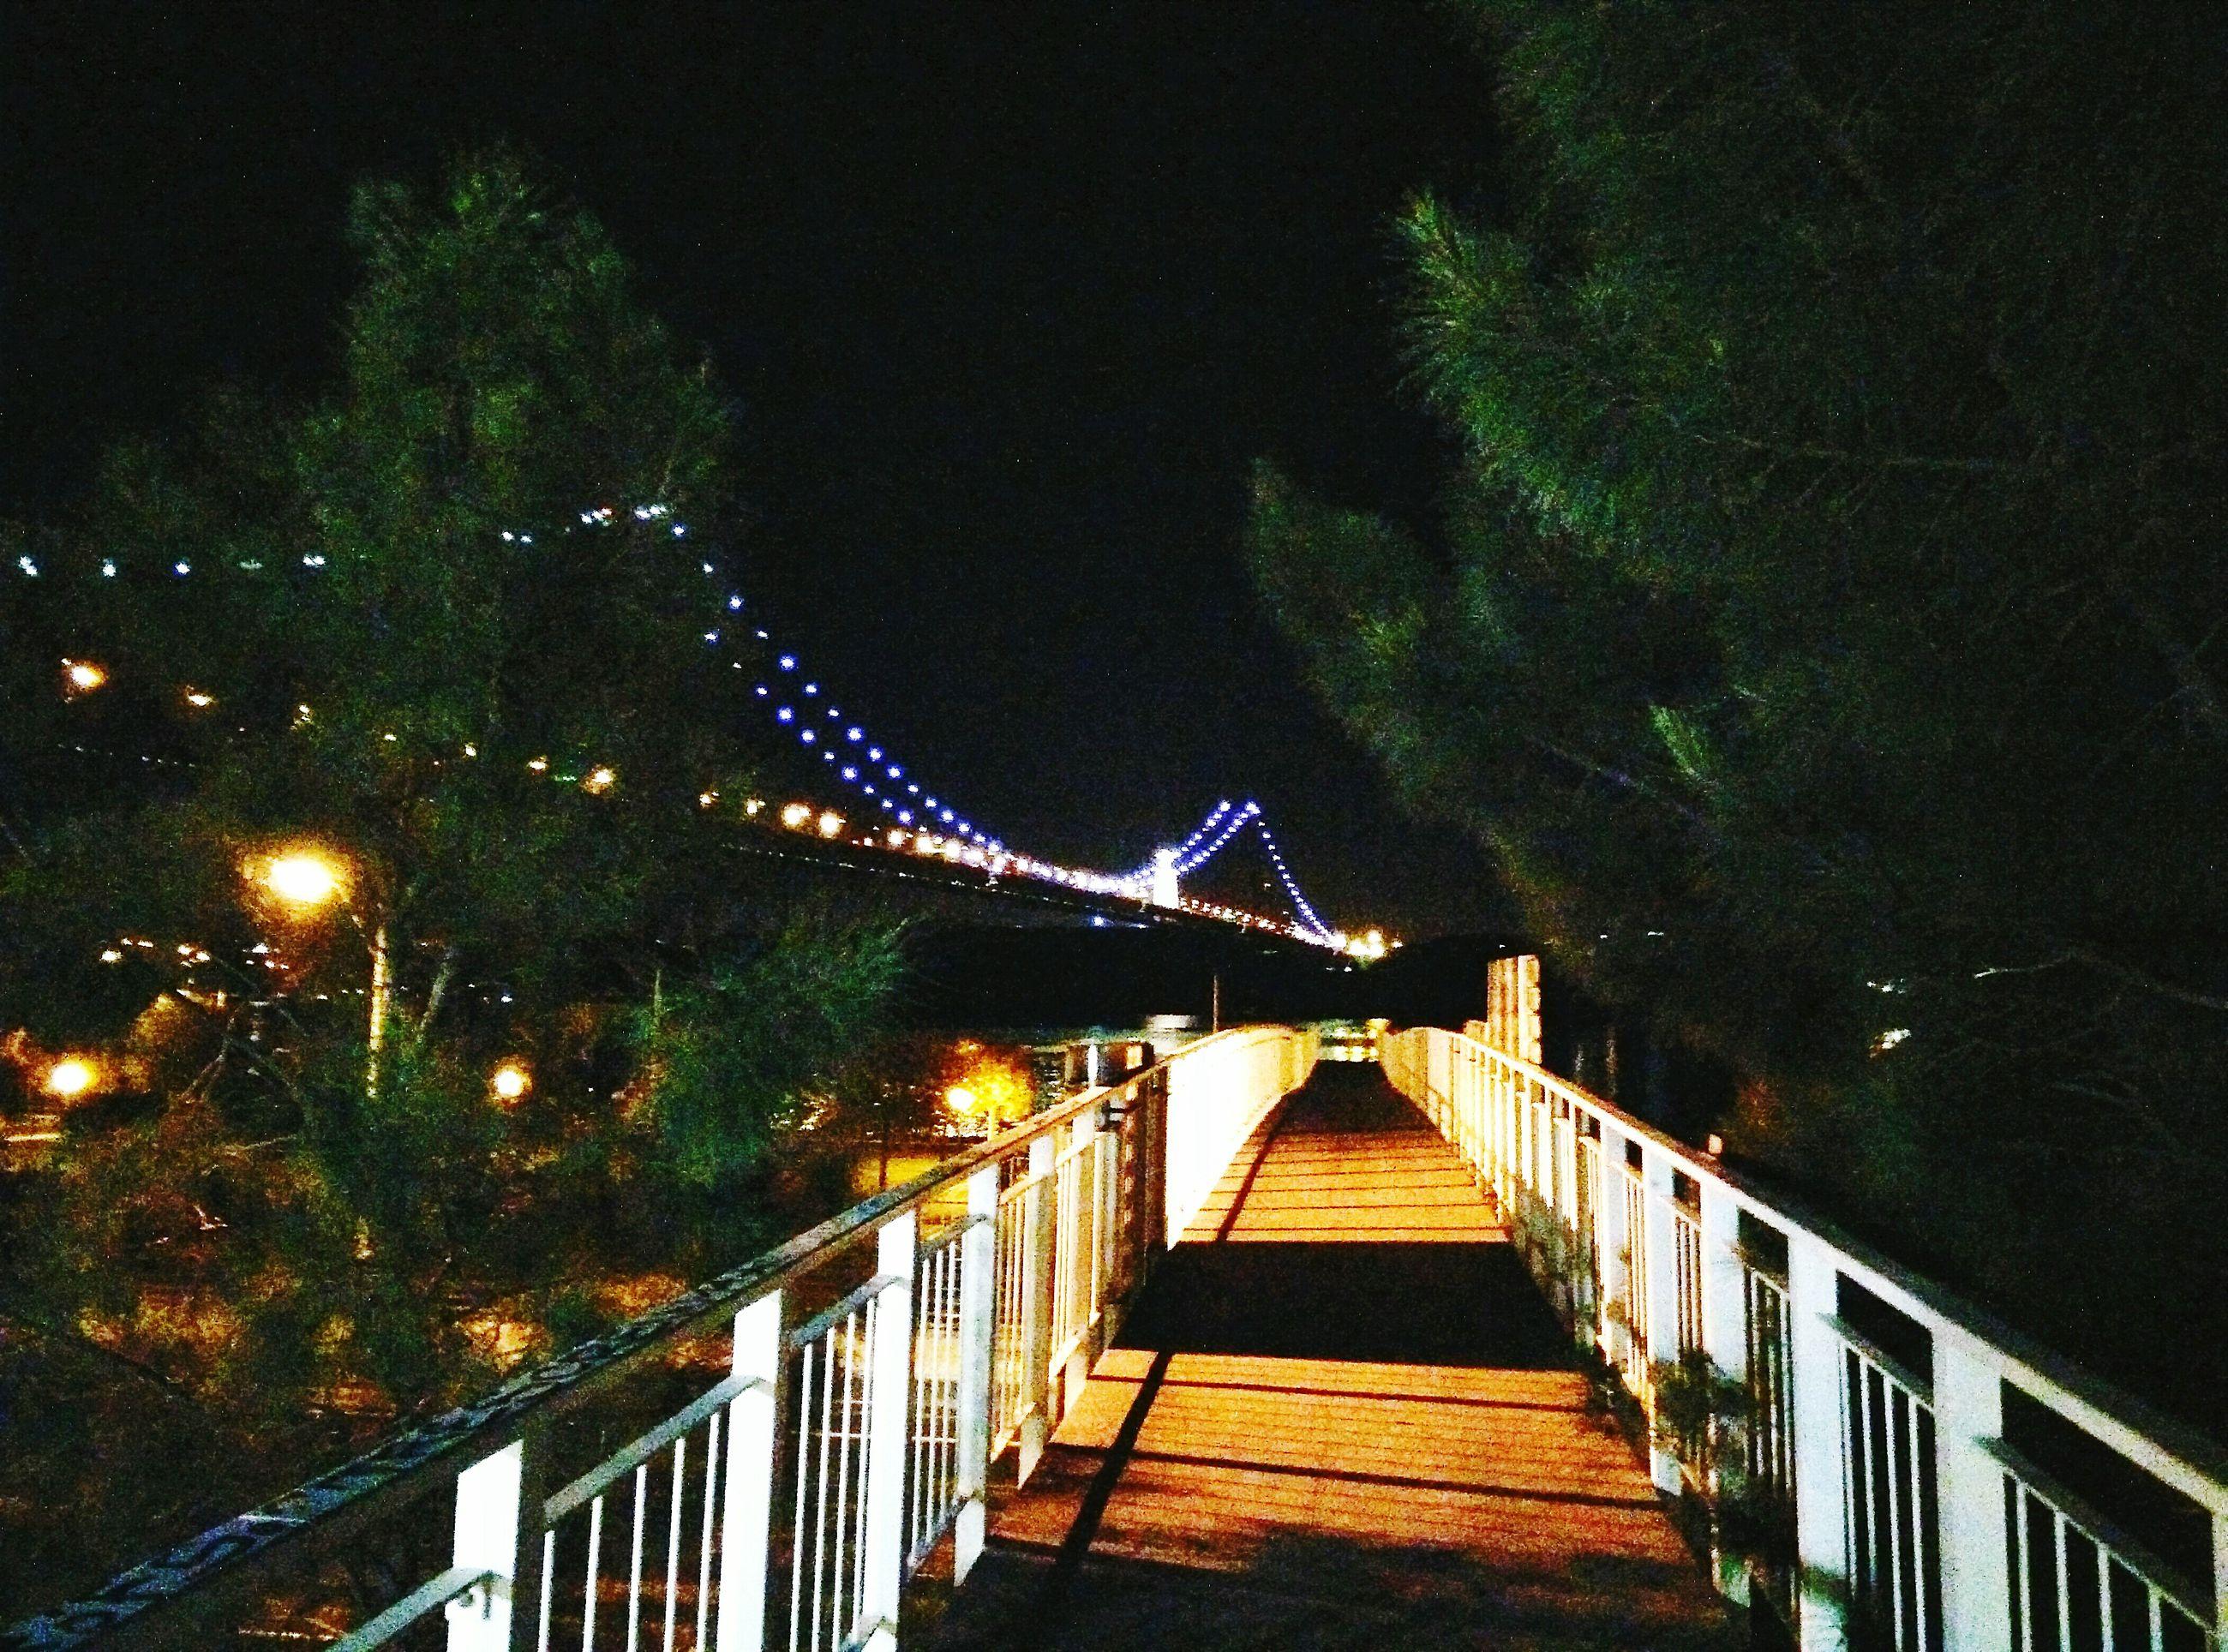 Footbridge leading towards illuminated bridge